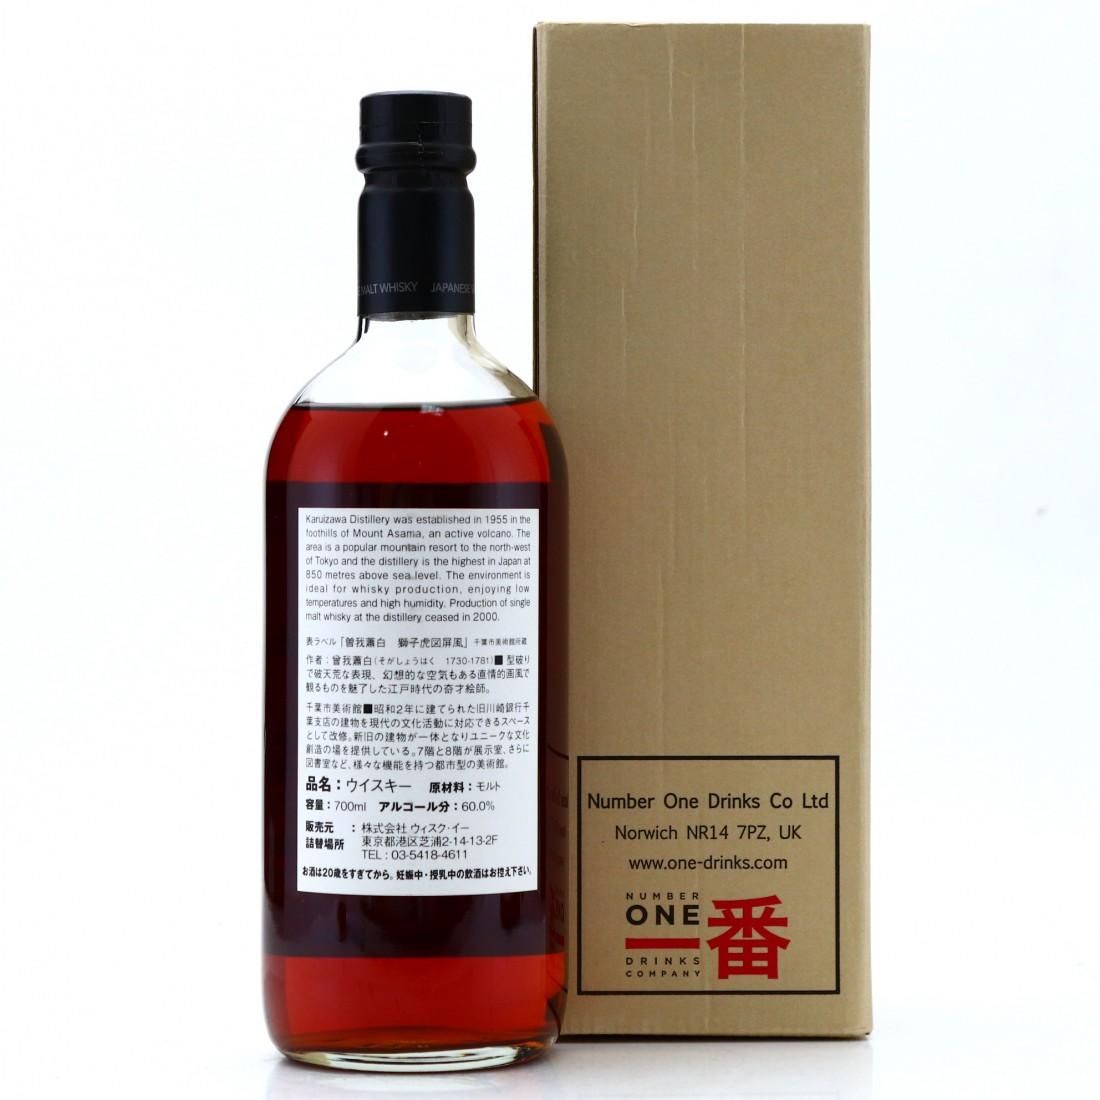 Karuizawa 1981 Single Cask Bourbon Cask 31 Year Old #4961 / Shinanoya